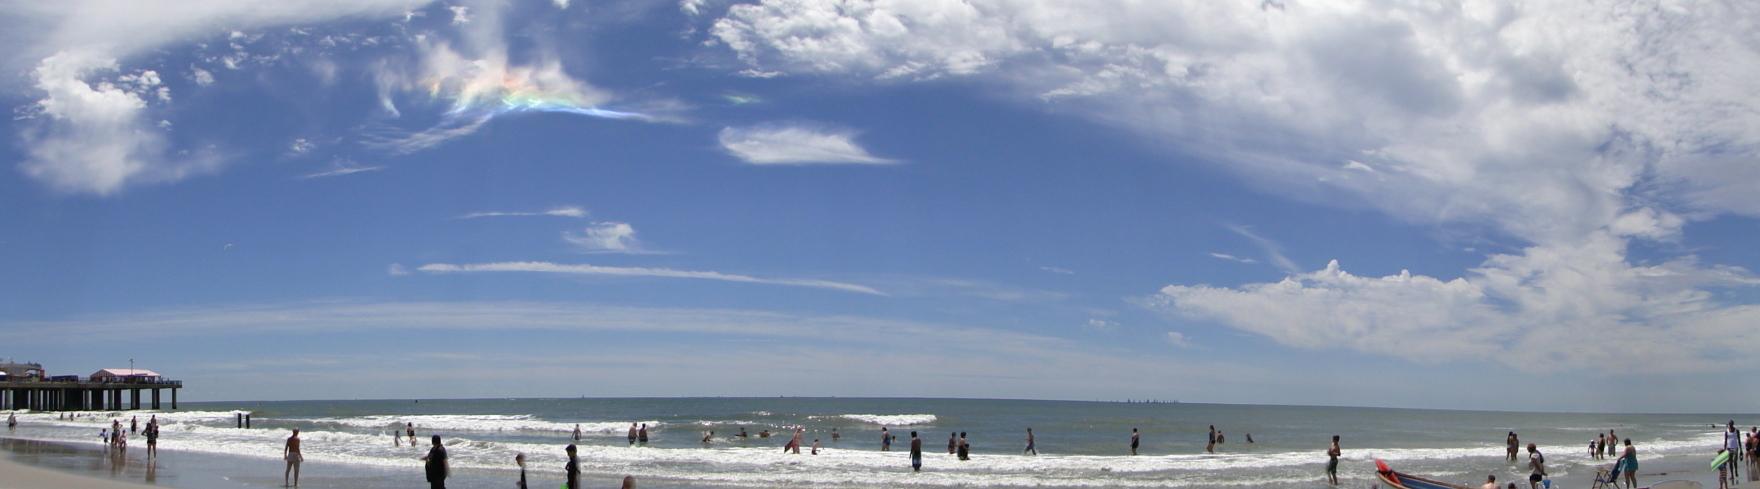 Iridescent Cloud, Atlantic City